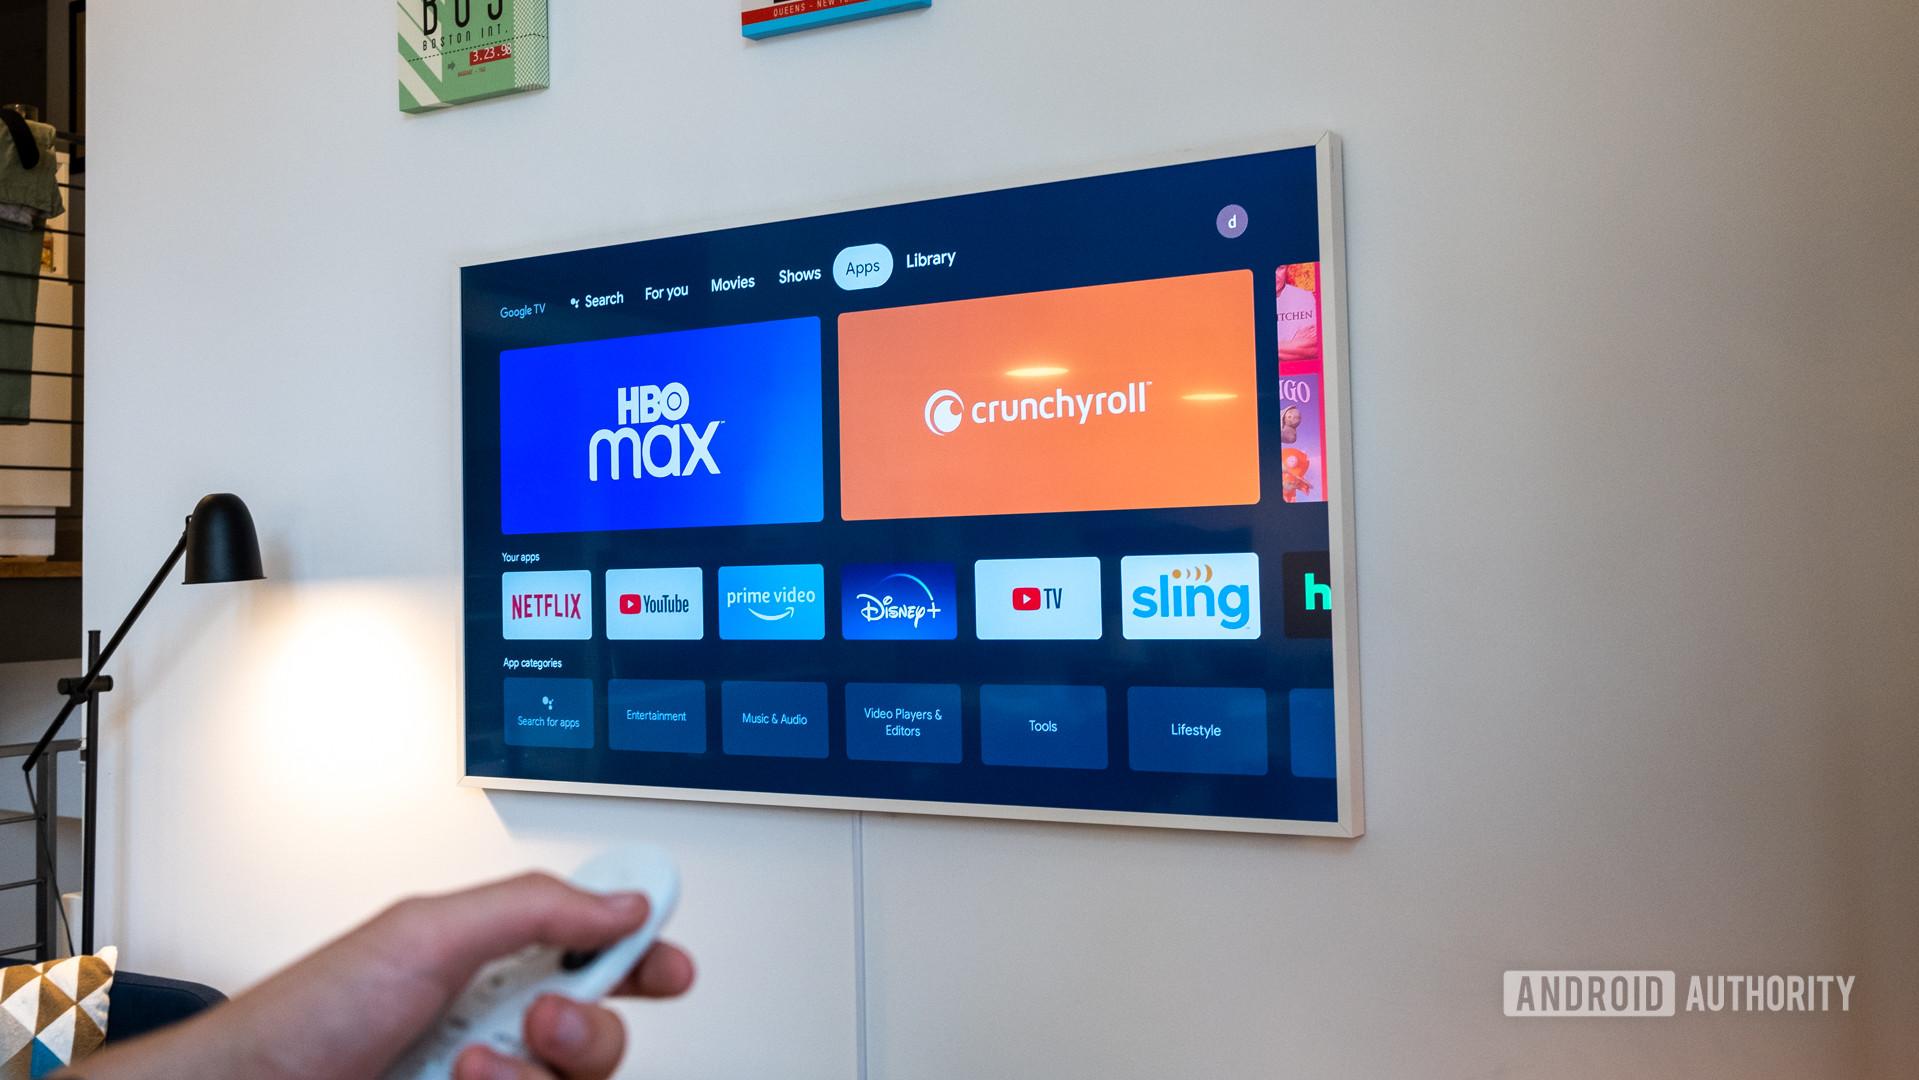 Google Chromecast with Google TV apps tab